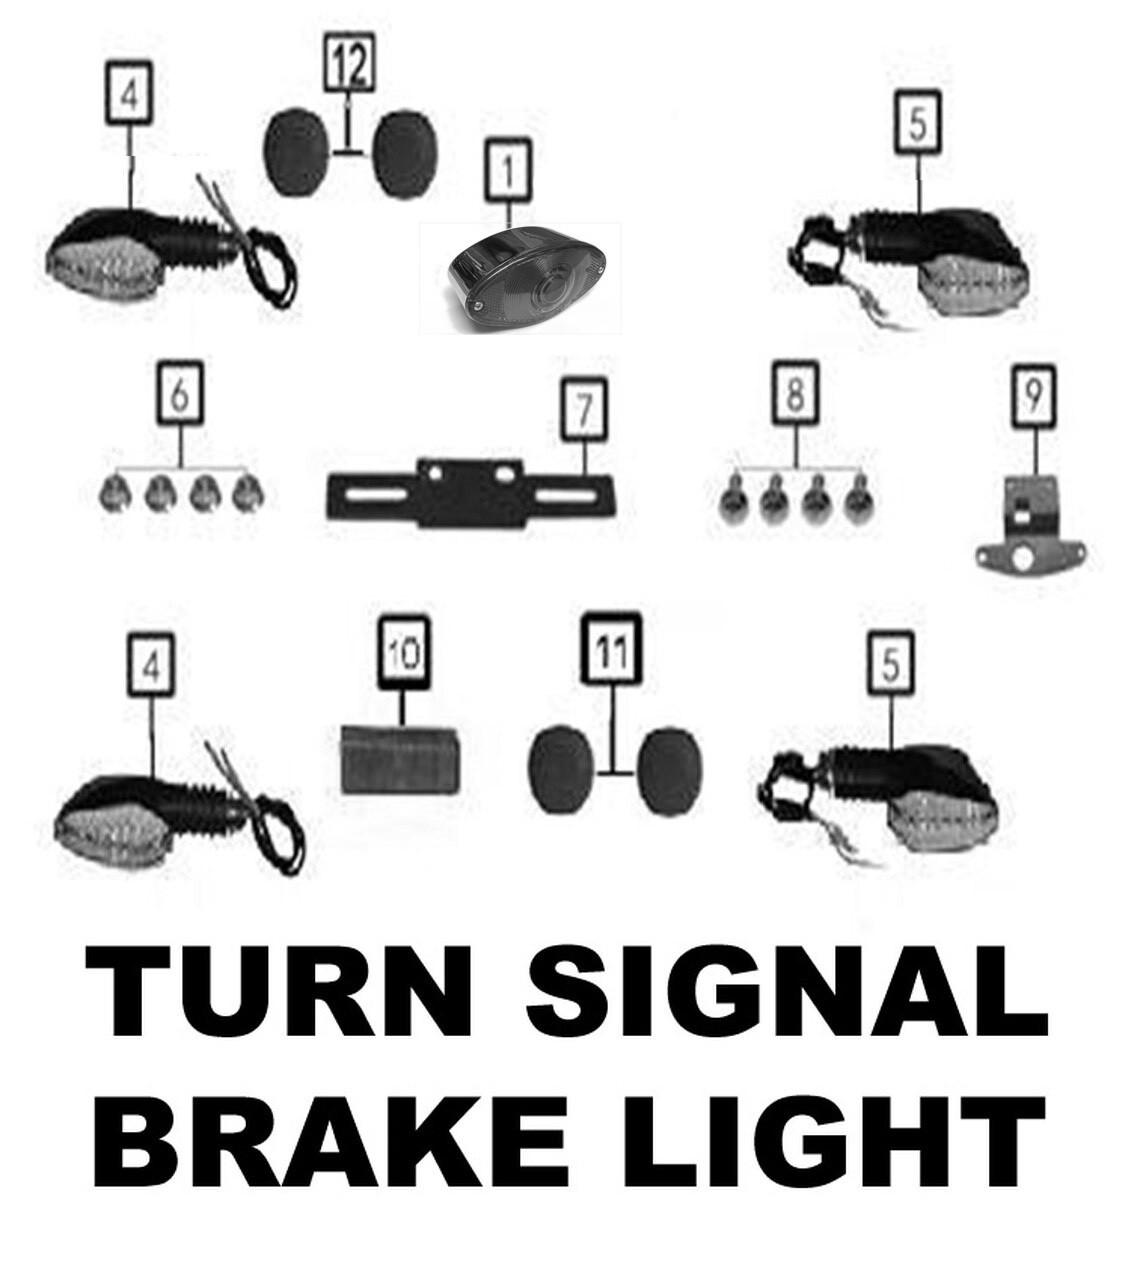 TURN SIGNALS / BRAKE LIGHT